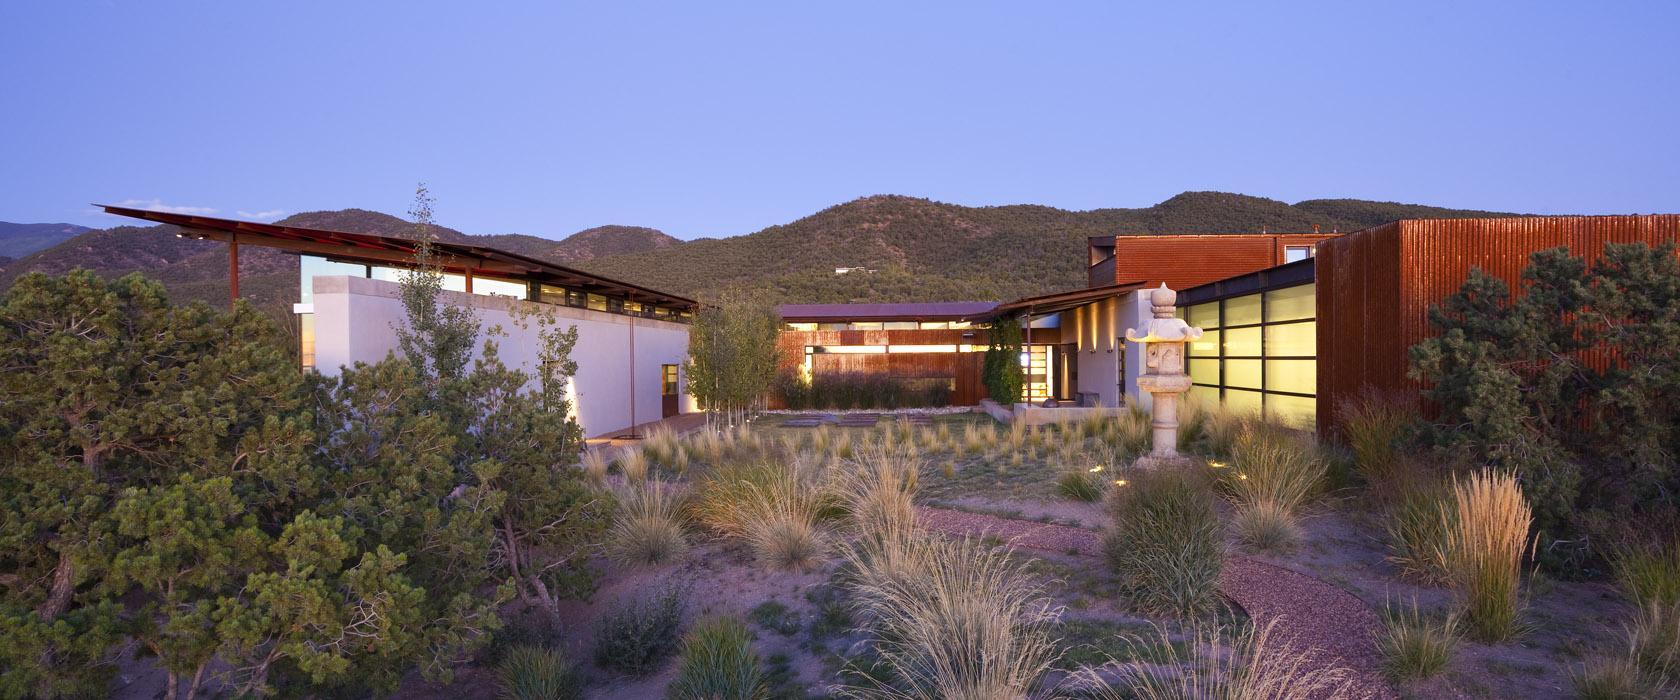 Architecture, Desert House in Santa Fe, New Mexico